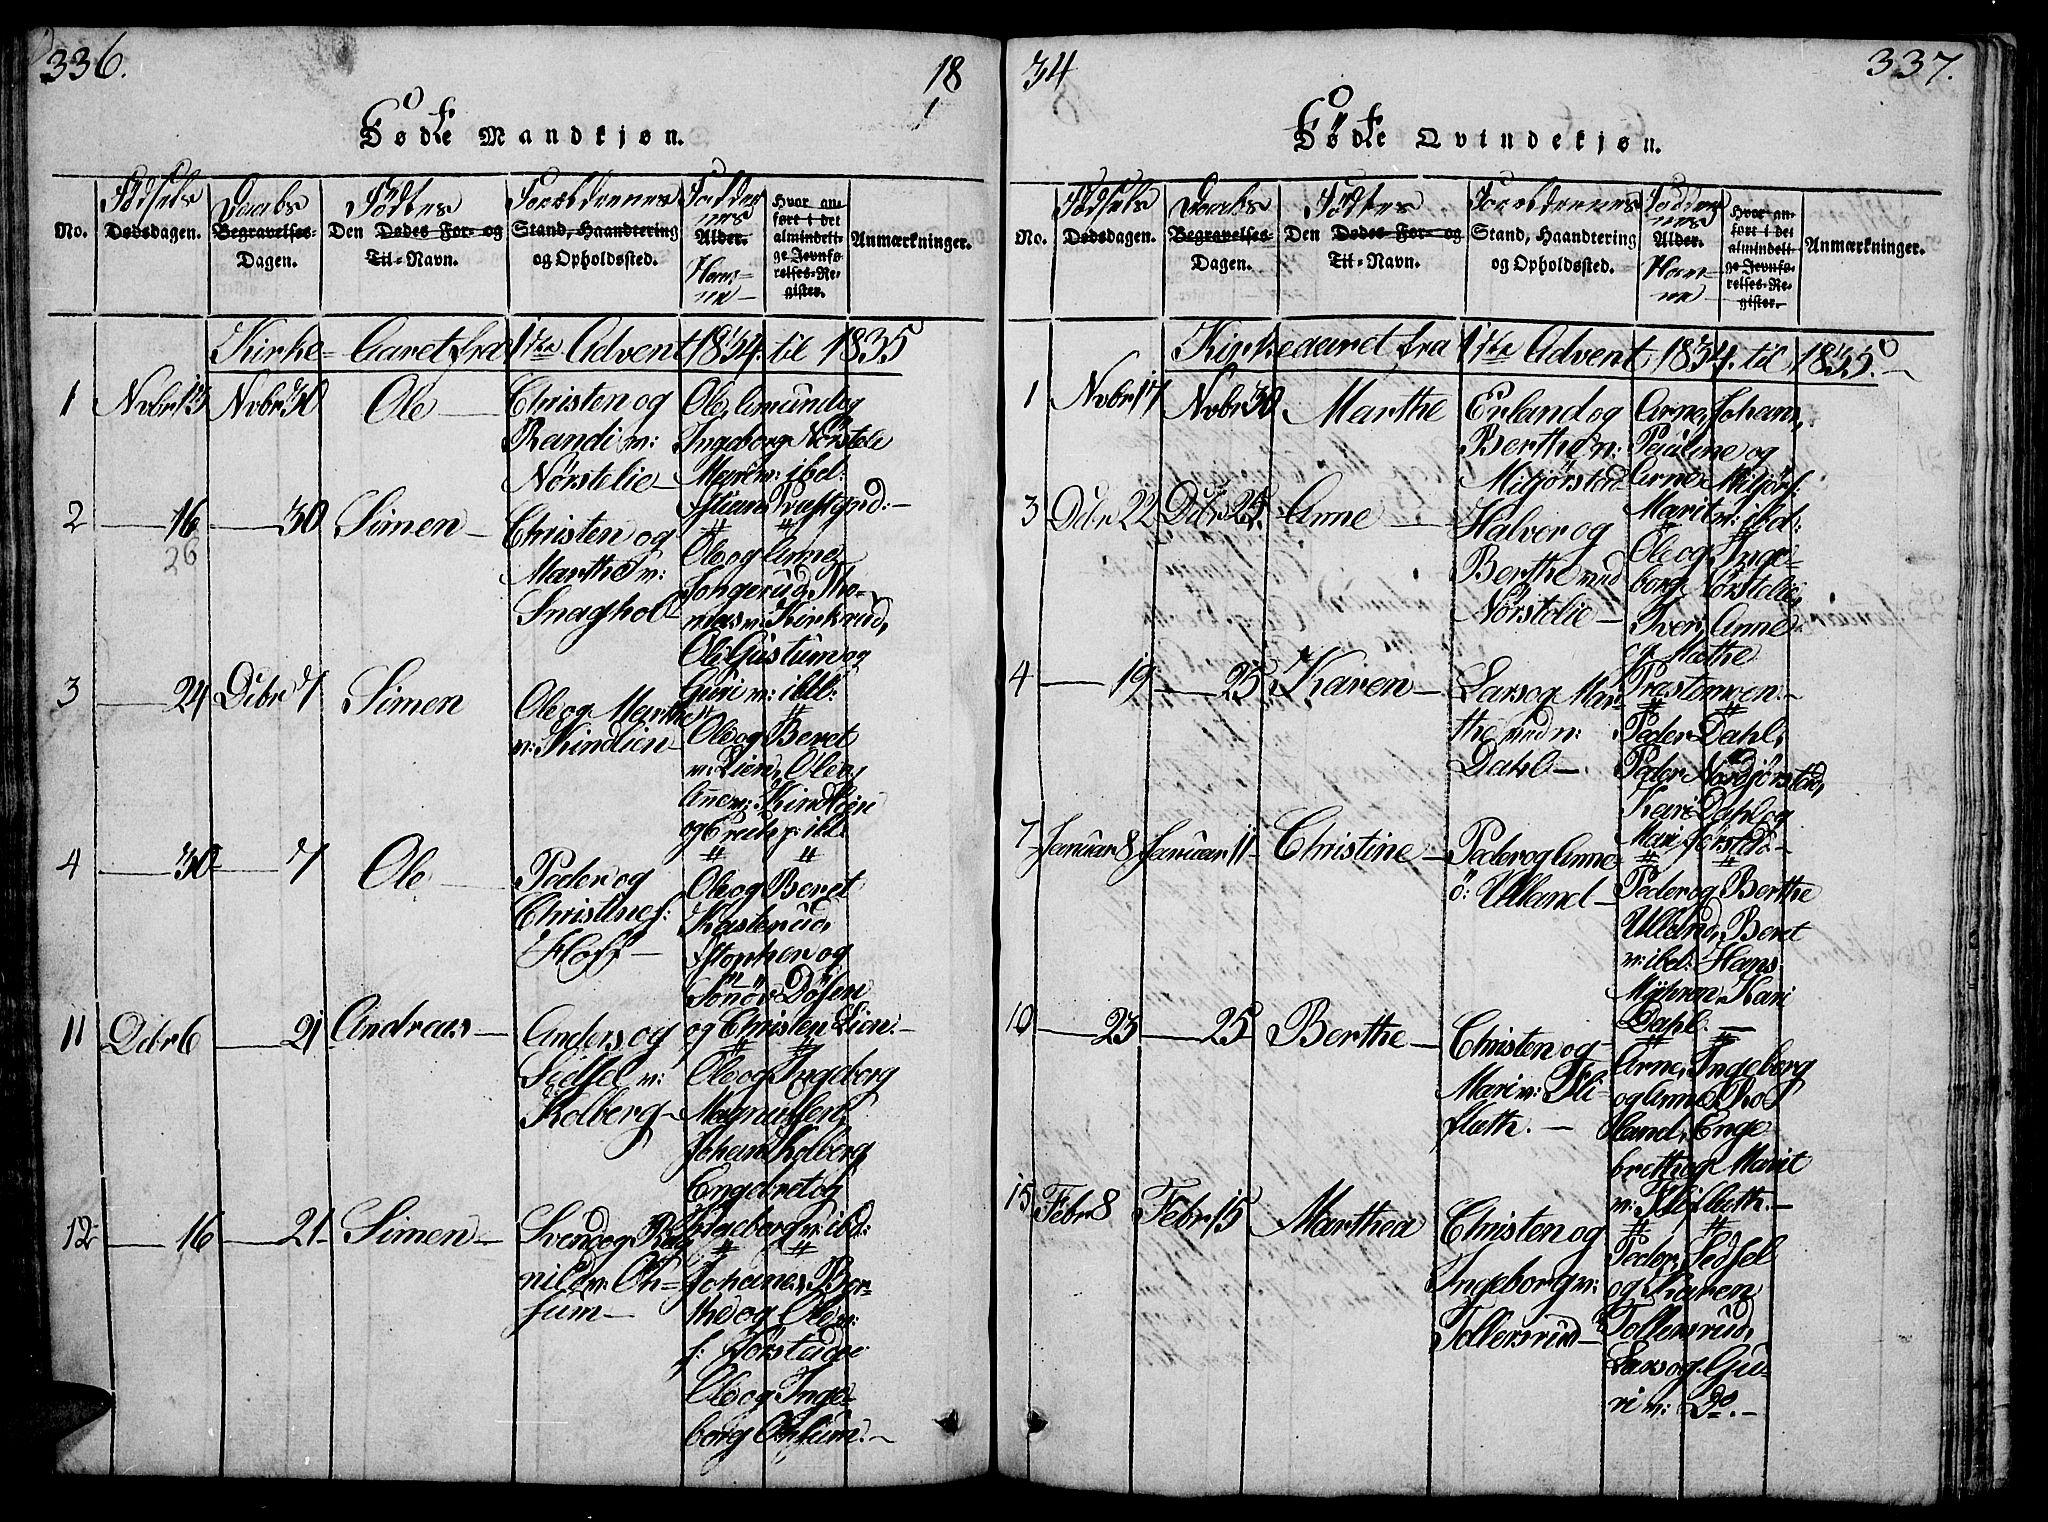 SAH, Fåberg prestekontor, H/Ha/Hab/L0004: Parish register (copy) no. 4, 1818-1837, p. 336-337